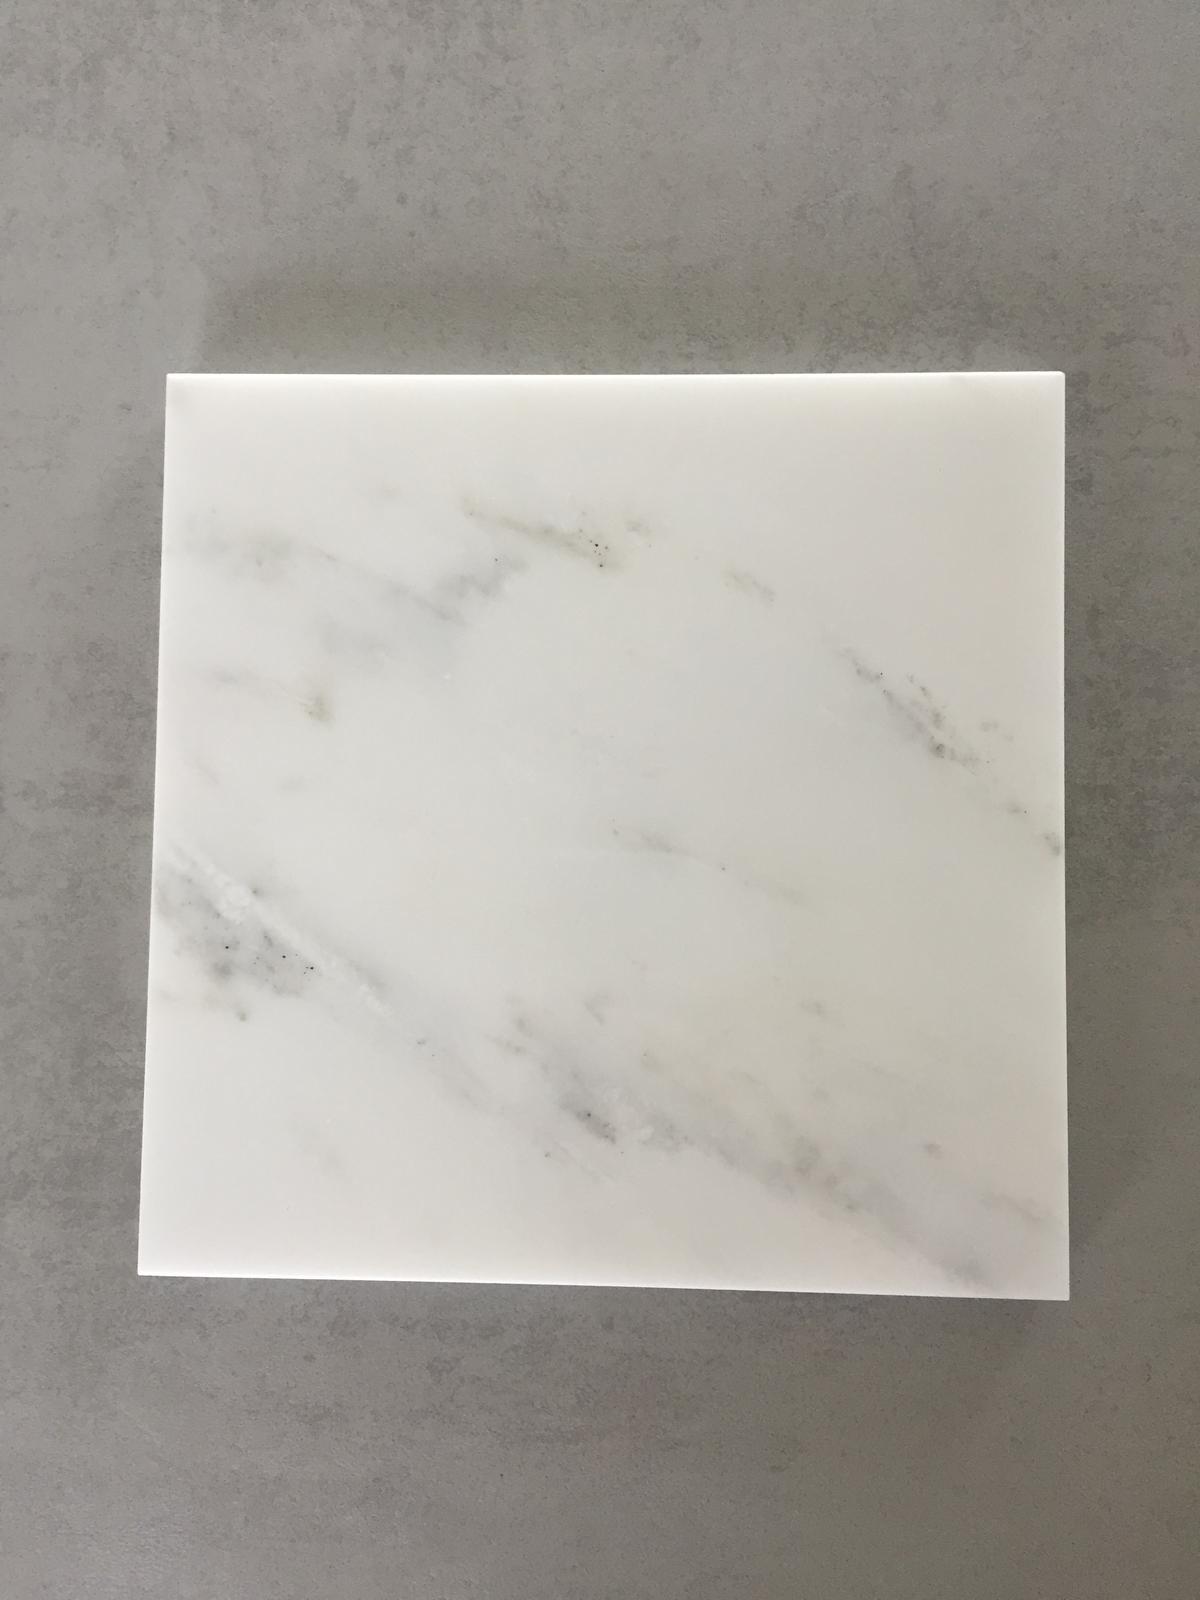 Servírovací tác Marble White 20x20cm - Obrázok č. 1